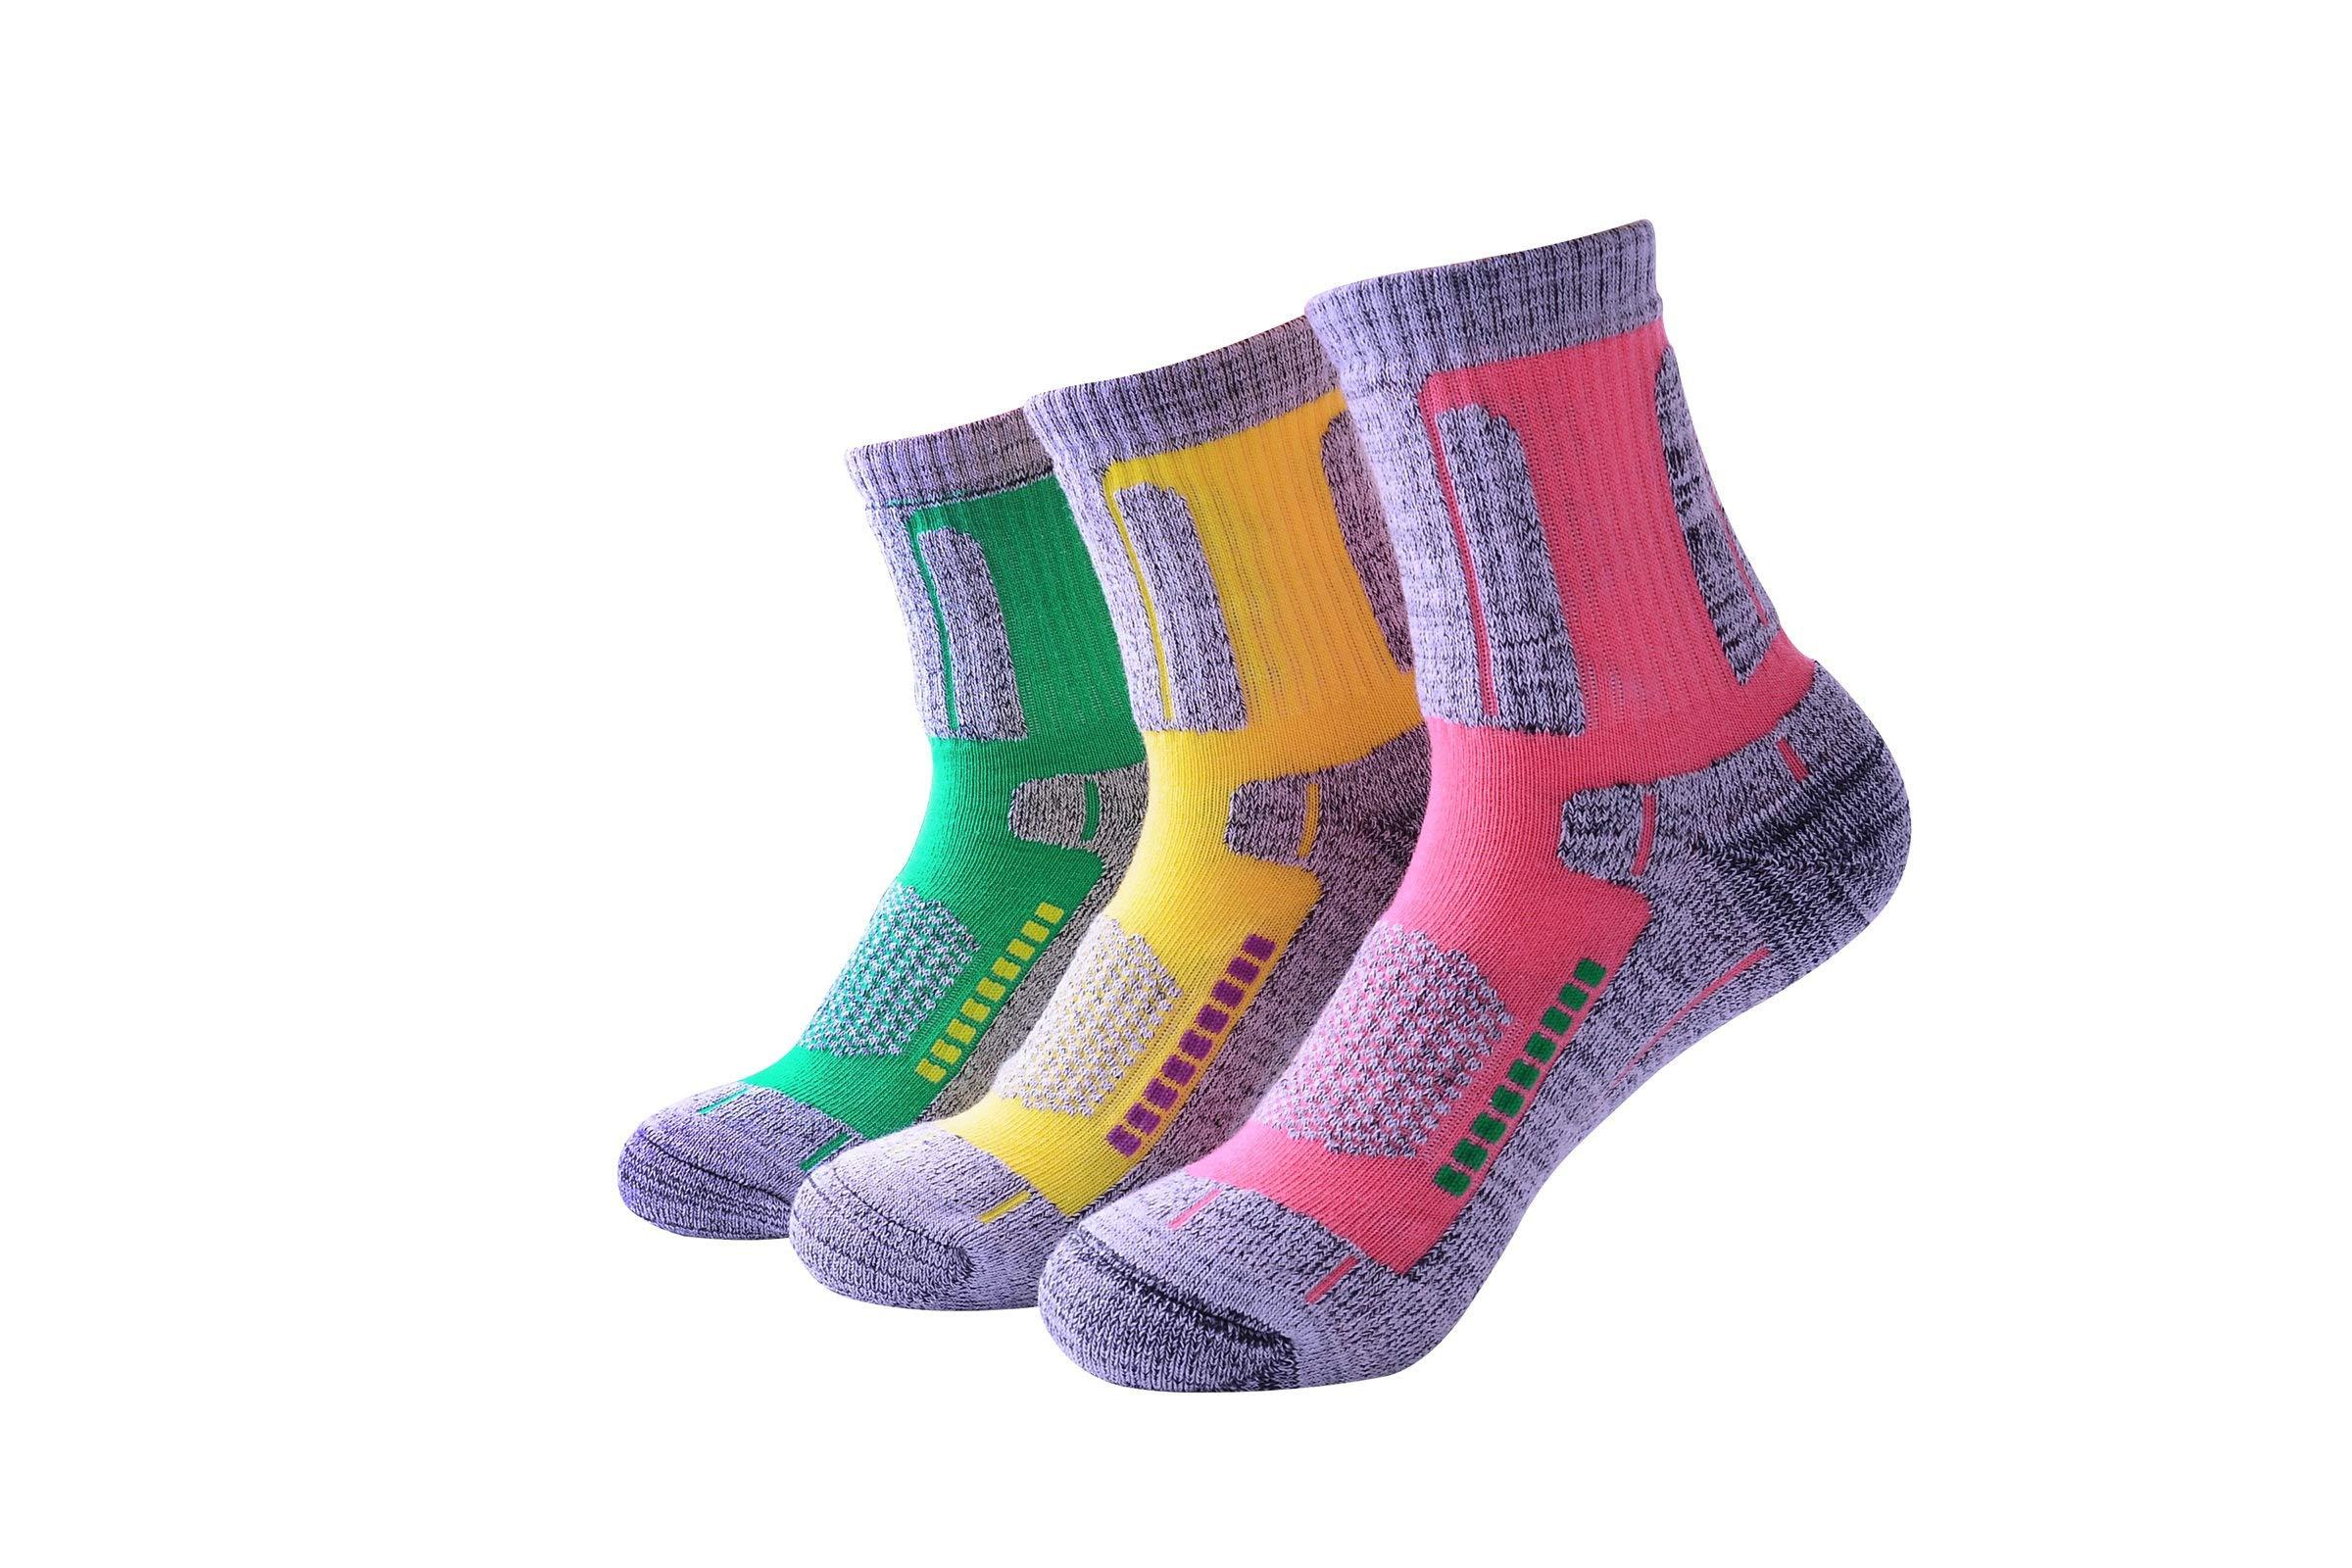 Outdoor Sports Mountaineering Ski Socks Hiking Socks High Tube M